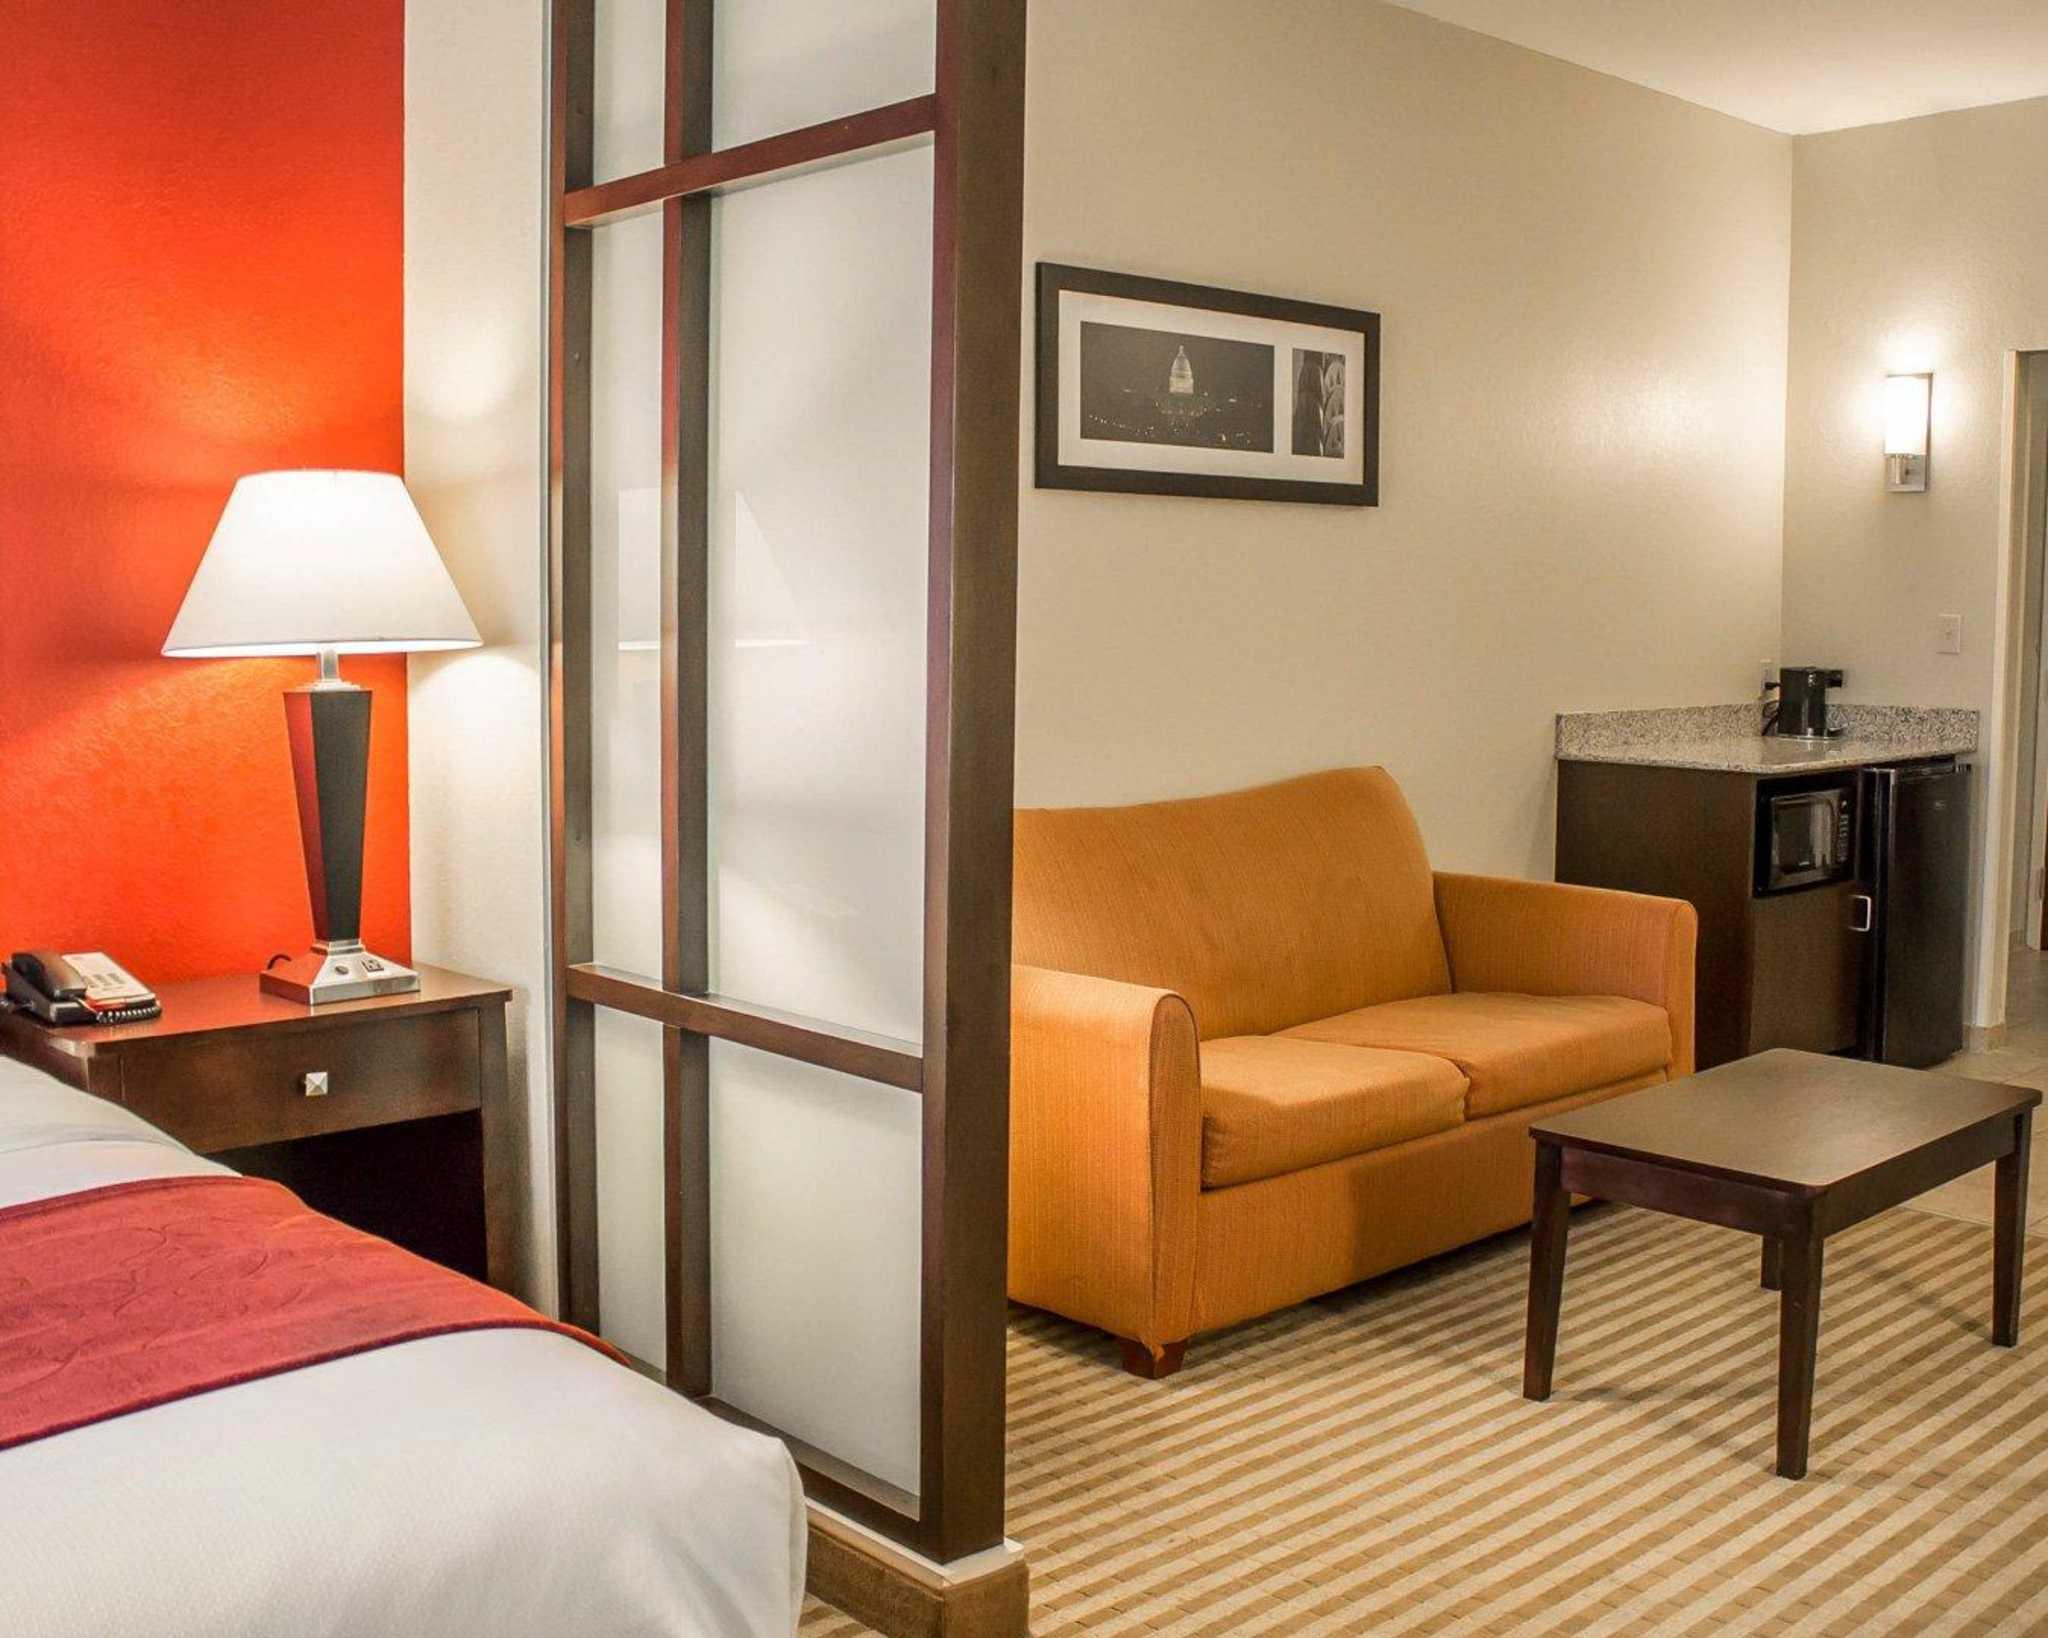 Comfort Suites East Broad at 270 image 22